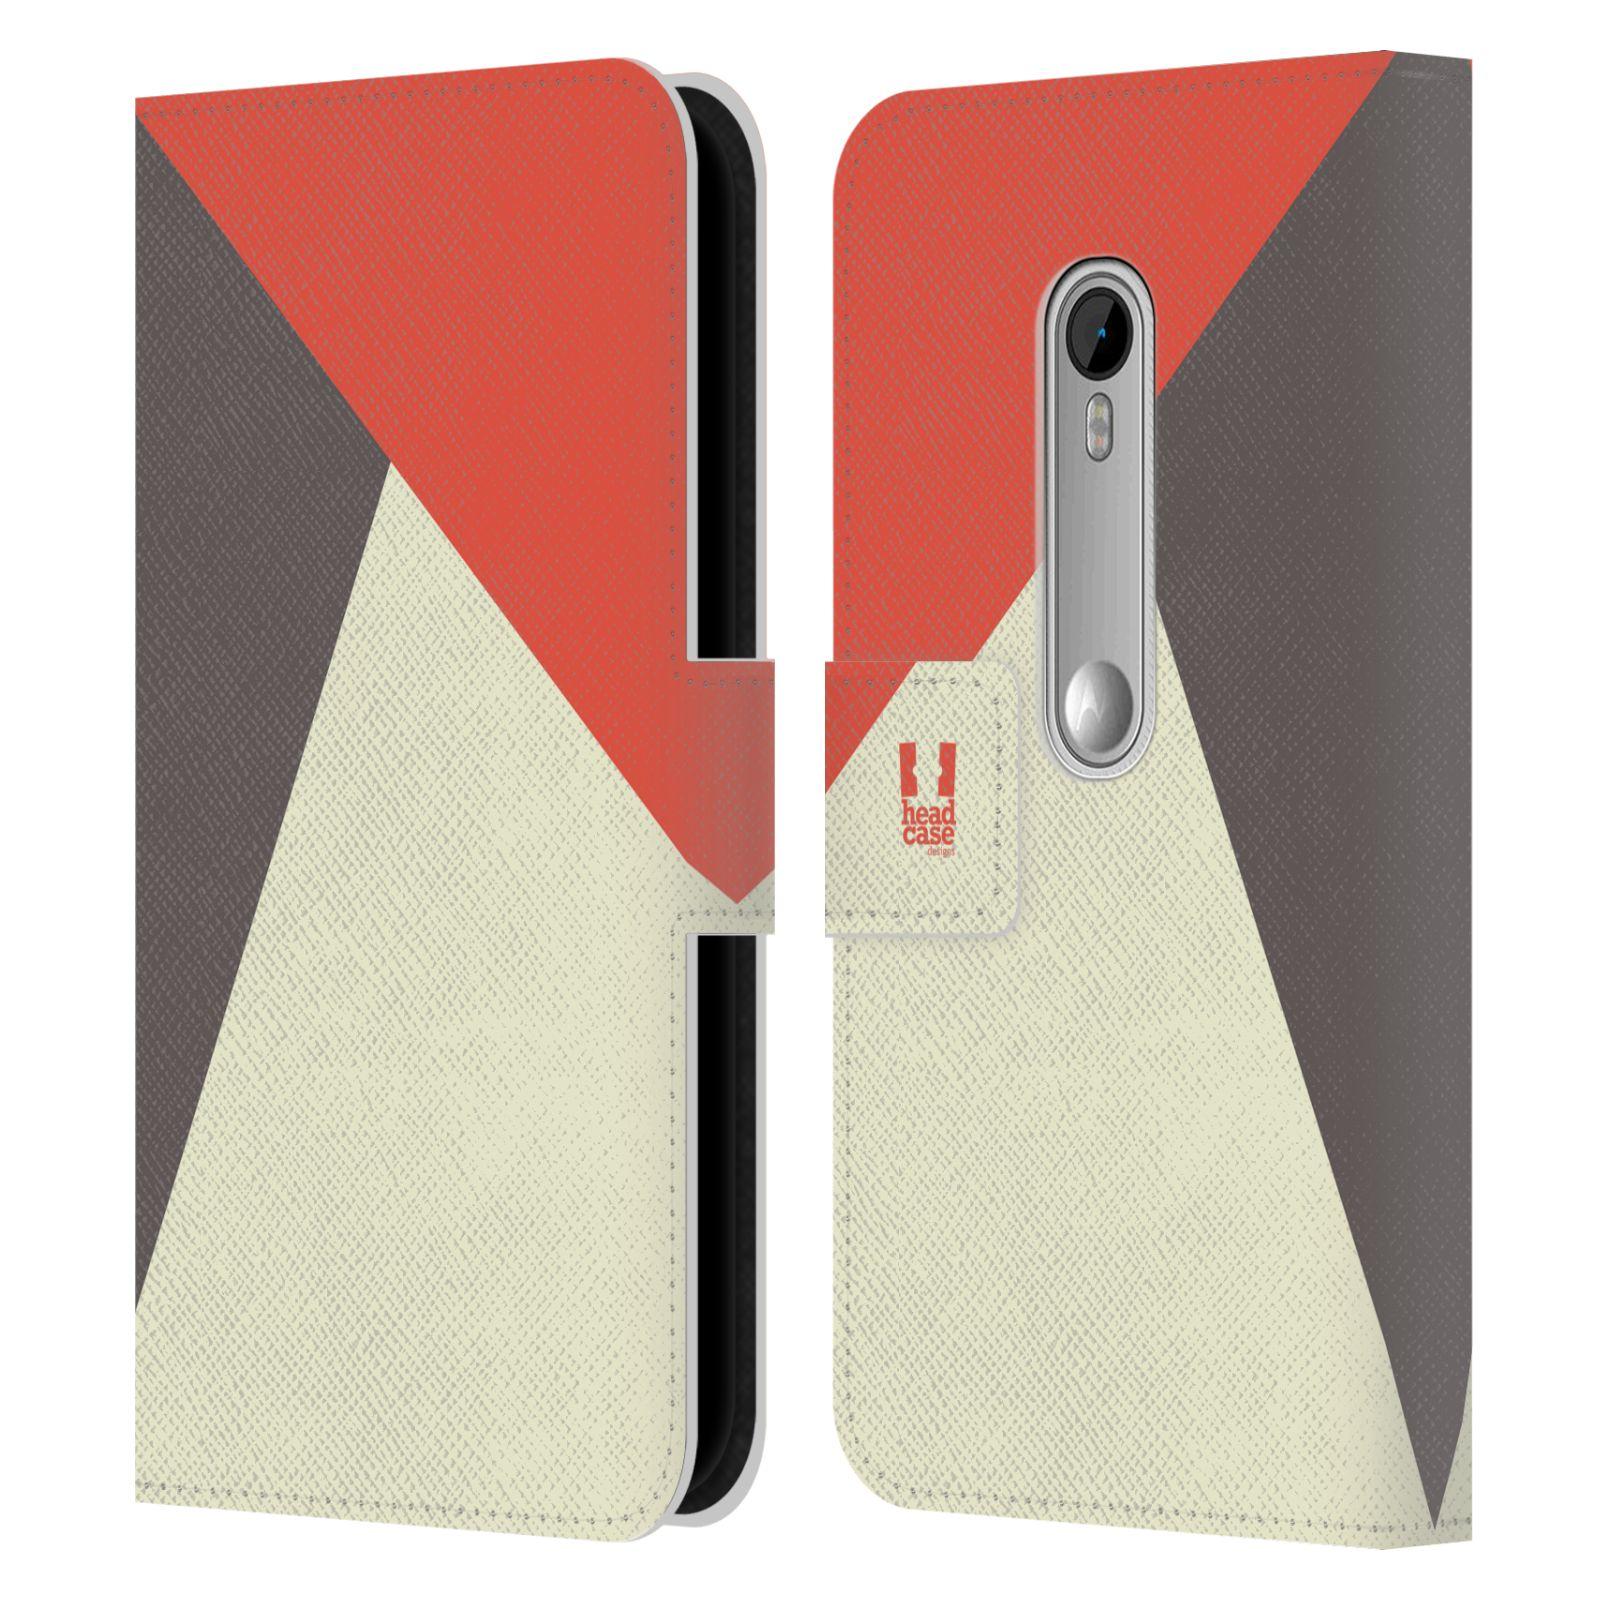 HEAD CASE Flipové pouzdro pro mobil Motorola MOTO G 3RD GENERATION barevné tvary červená a šedá COOL